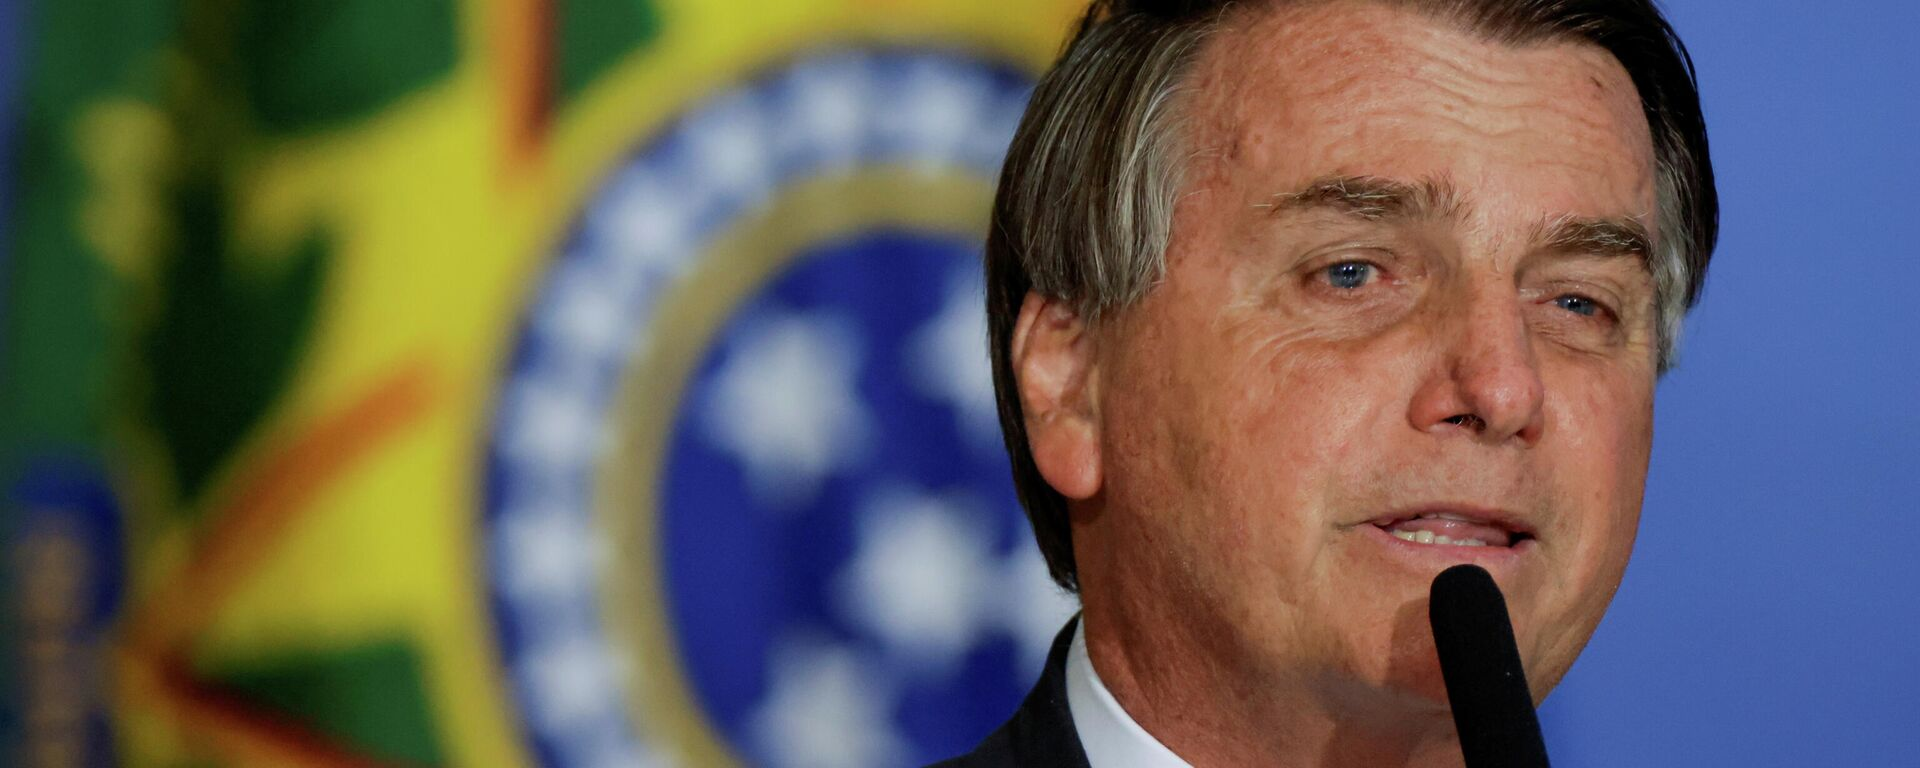 Jair Bolsonaro, presidente de Brasil - Sputnik Mundo, 1920, 12.07.2021